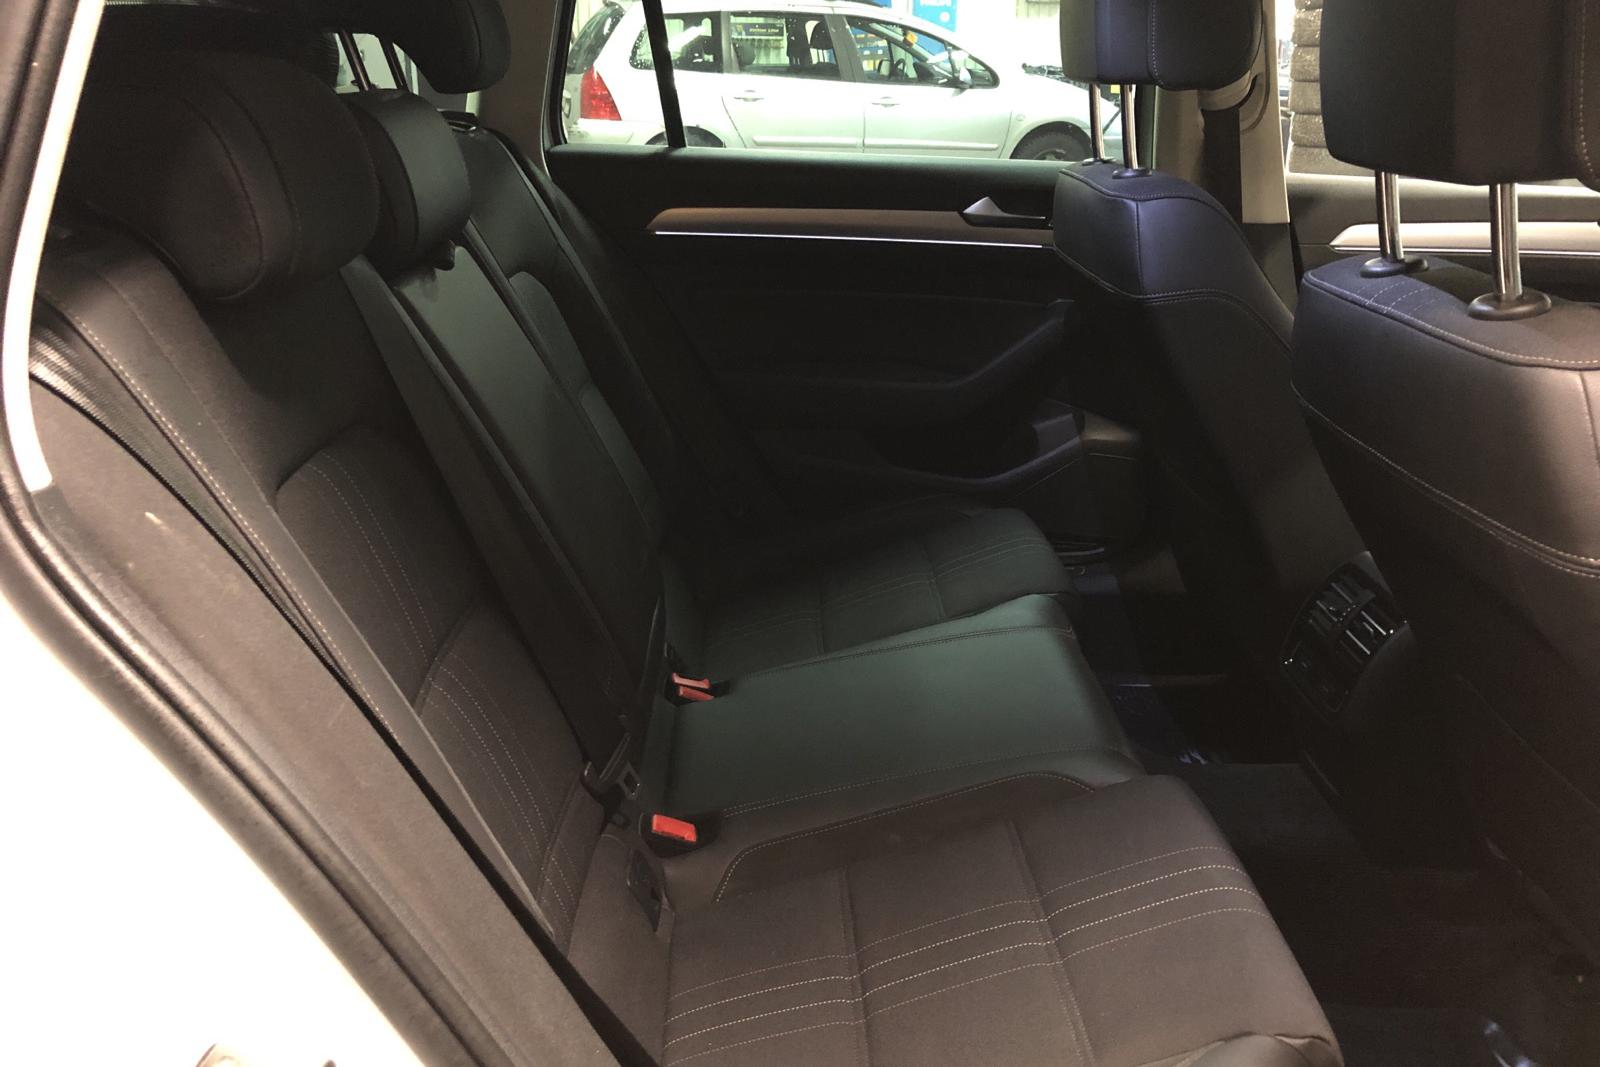 VW Passat Alltrack 2.0 TDI Sportscombi 4MOTION (190hk) - 144 270 km - Automatic - white - 2017